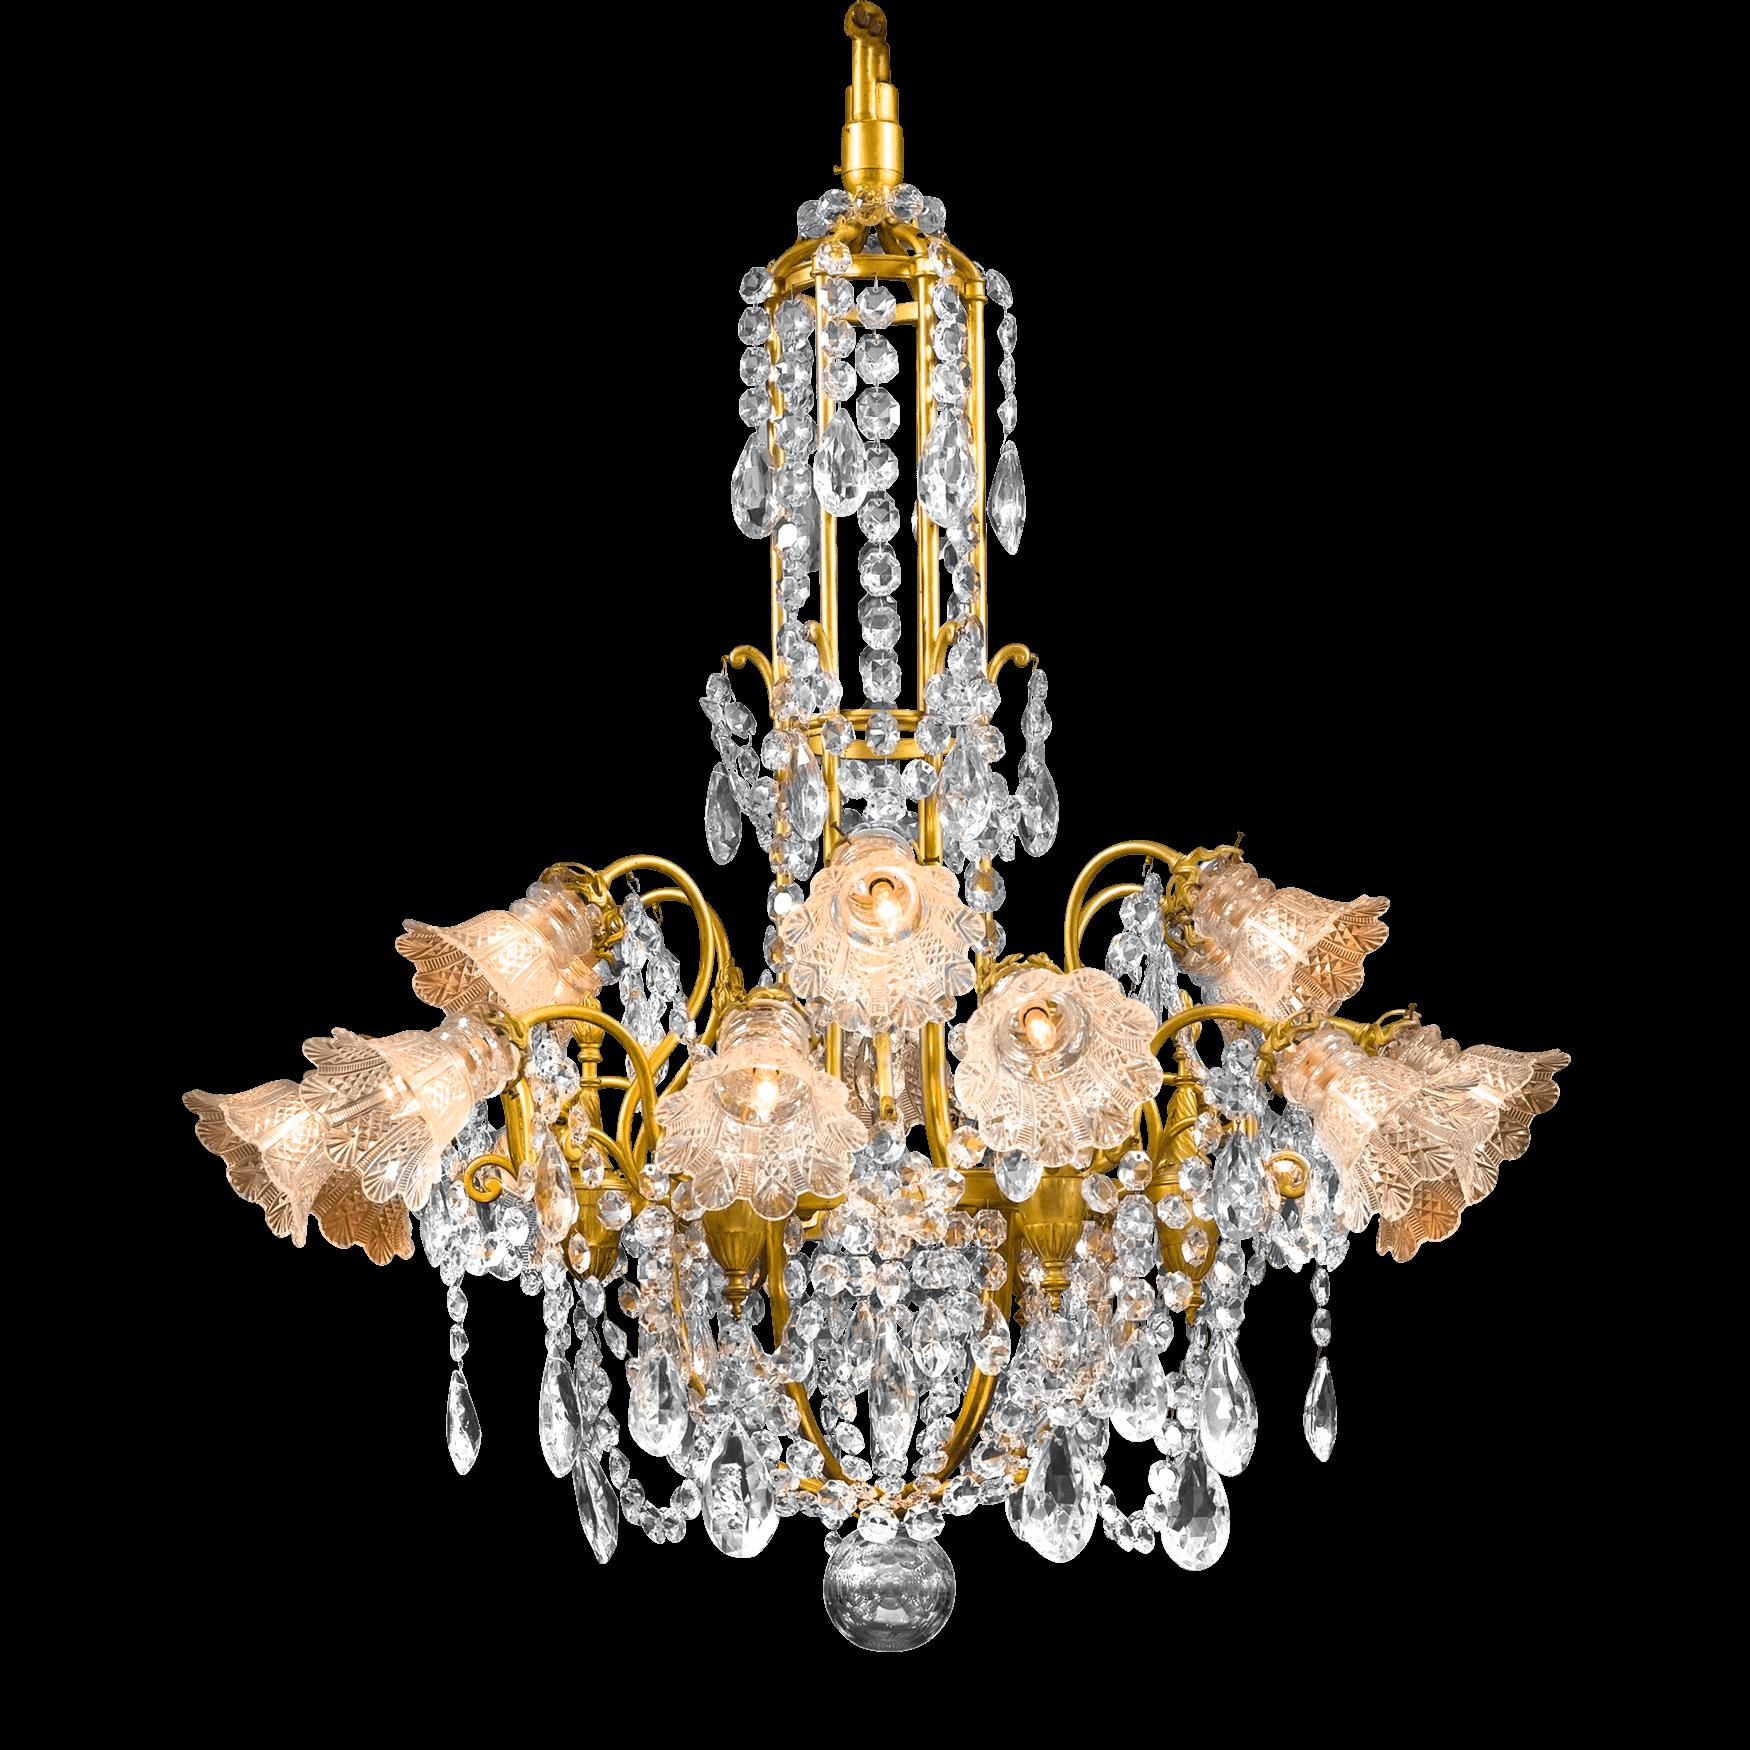 Antique baccarat crystal chandelier dore bronze circa 1880 my antique baccarat crystal chandelier dore bronze circa 1880 aloadofball Choice Image